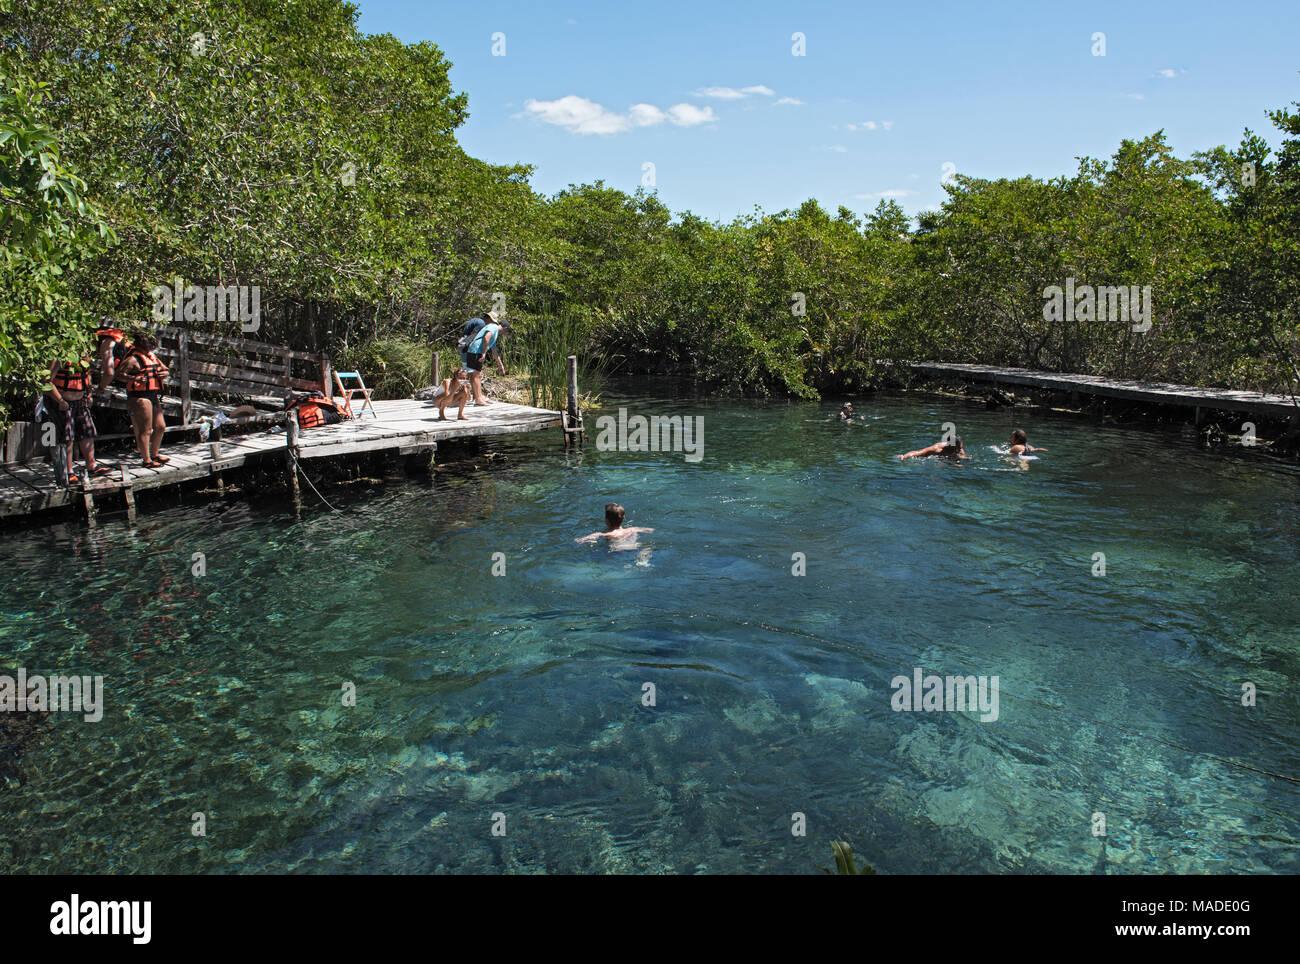 Tourists swimming in the Cenote Yalahau, Holbox, Quintana Roo, Mexico - Stock Image